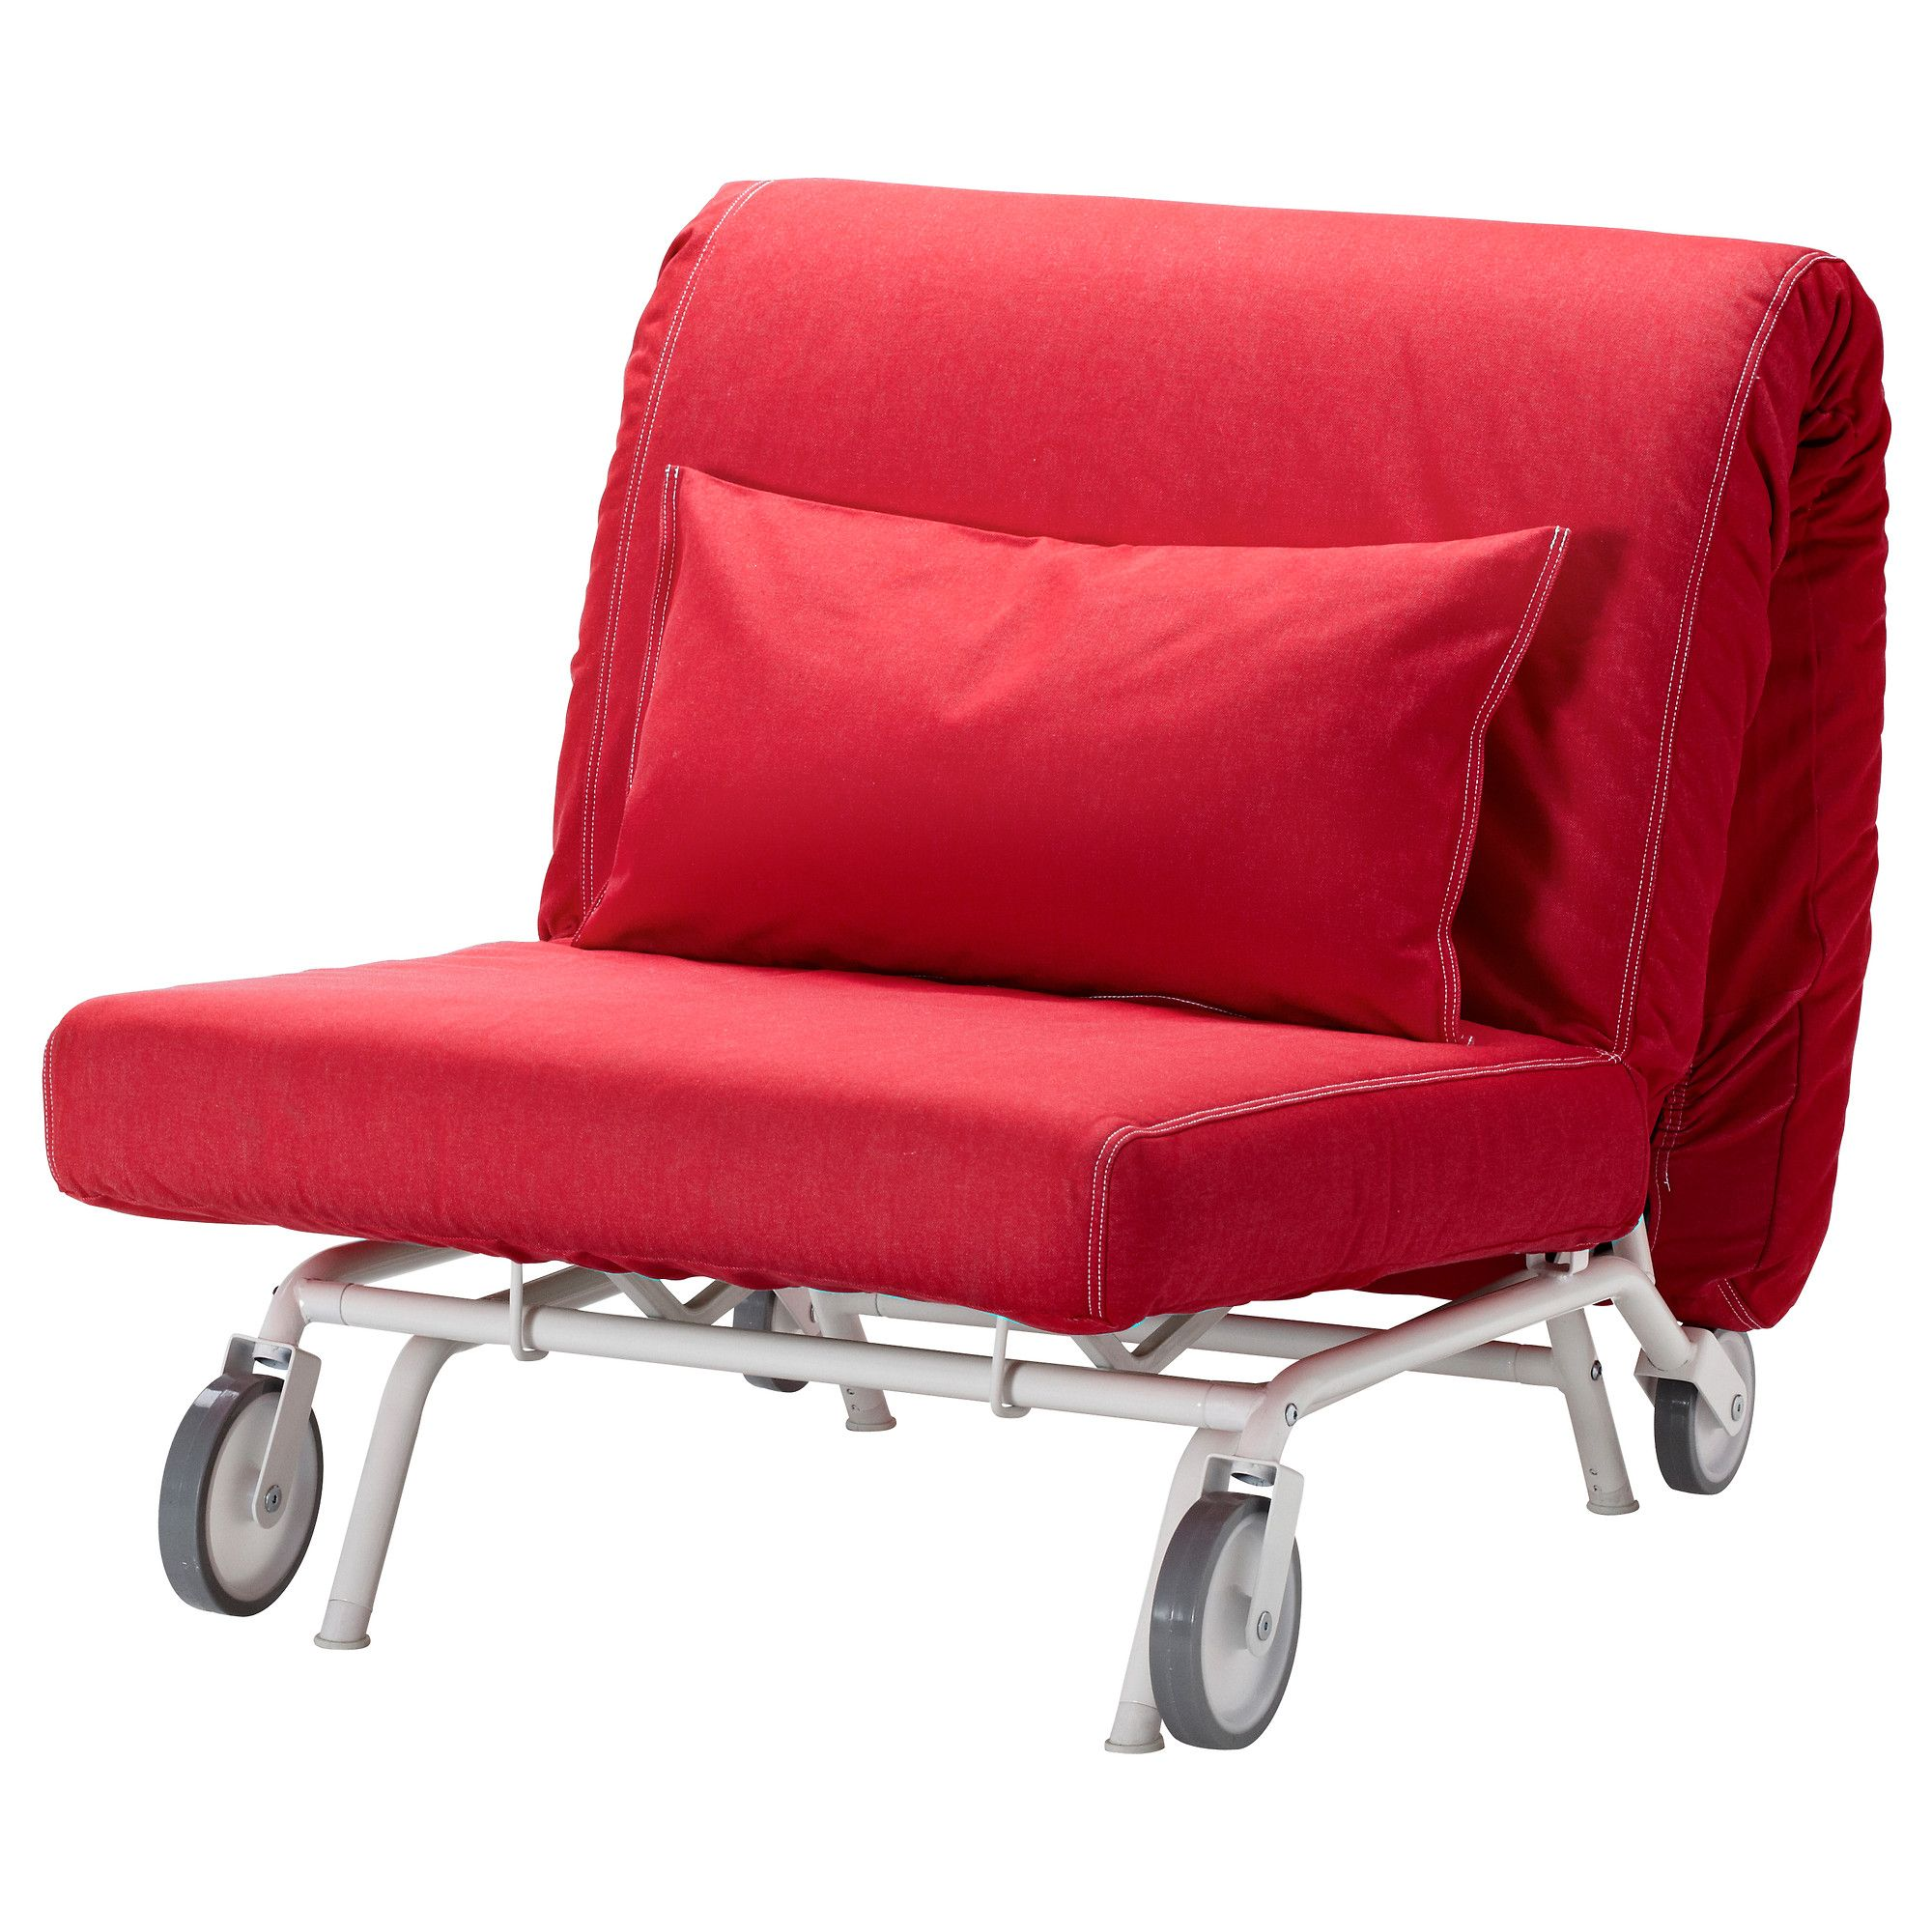 ikea ps la va s fauteuil lit vansta rouge ikea meubles a